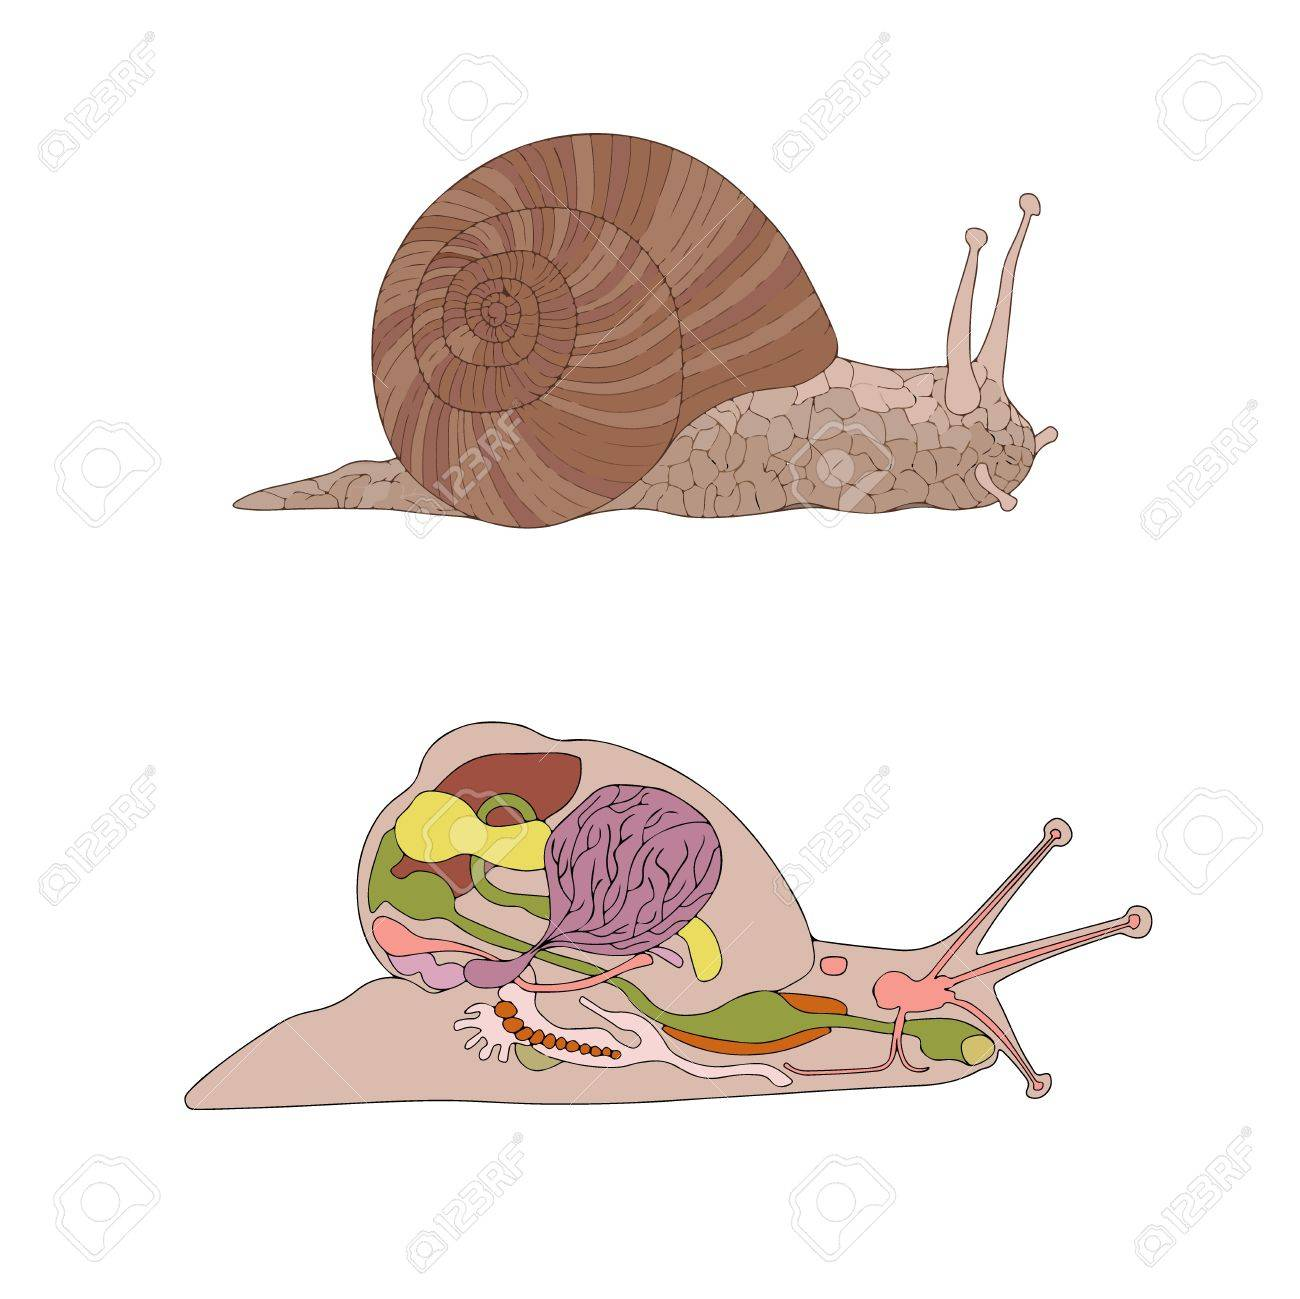 Zoology, Anatomy, Morphology, Cross-section Of Snail Royalty Free ...